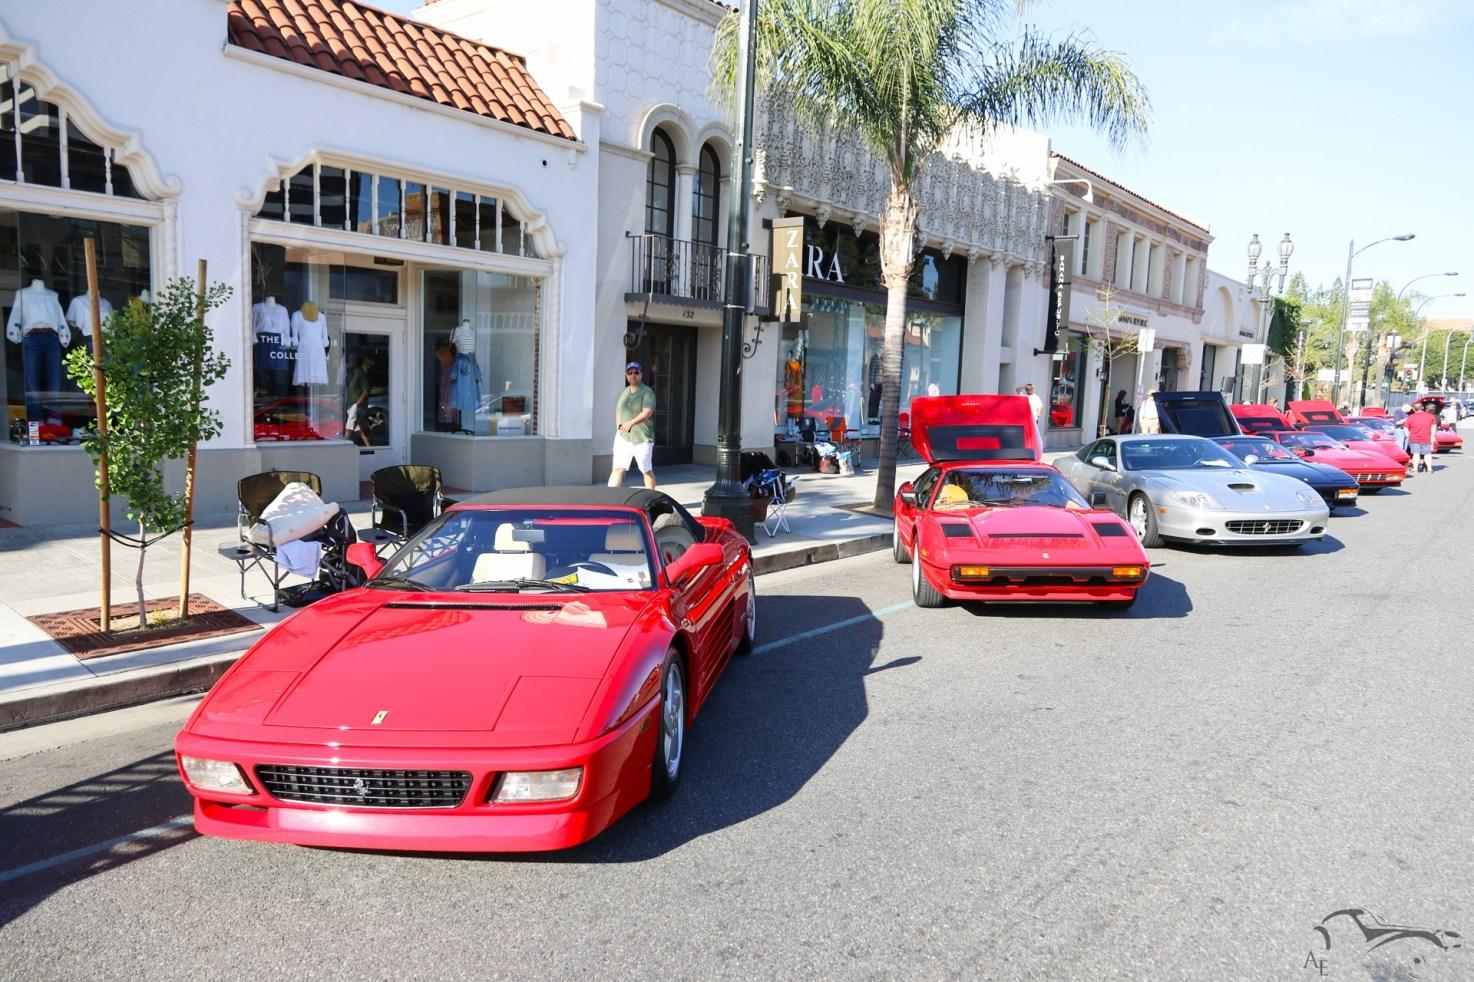 Ferrari 348 Spider and 308 GTB